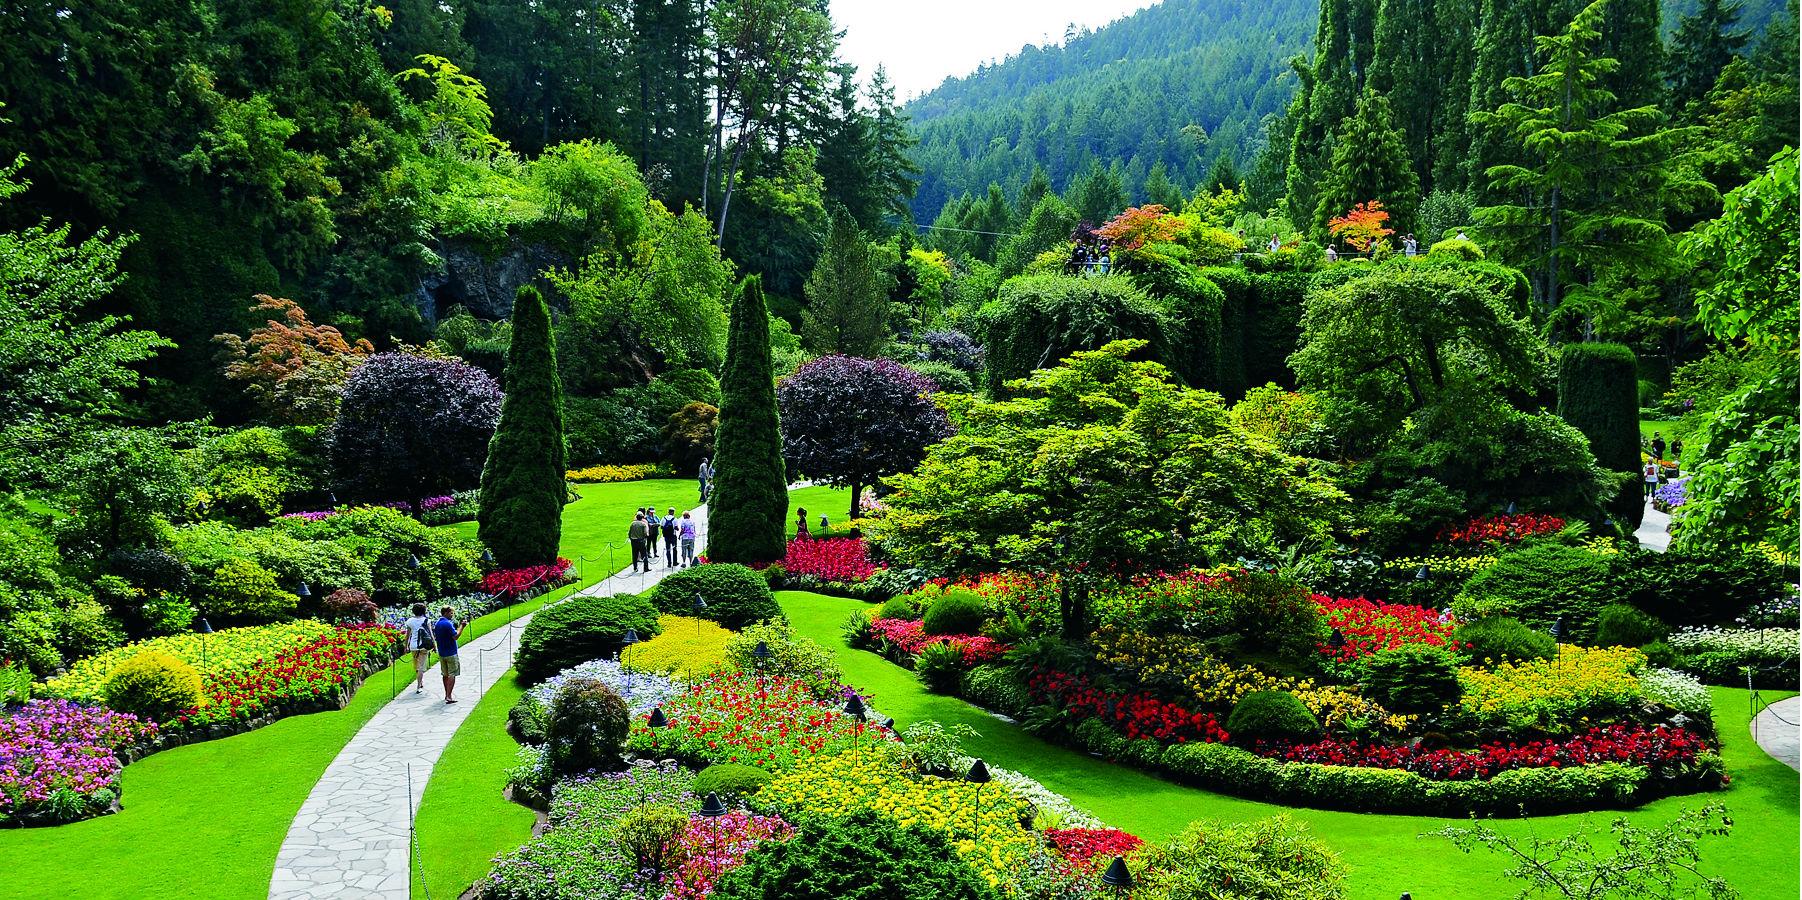 Butchart-Gardens-Sunken-Garden-Summer.jpg